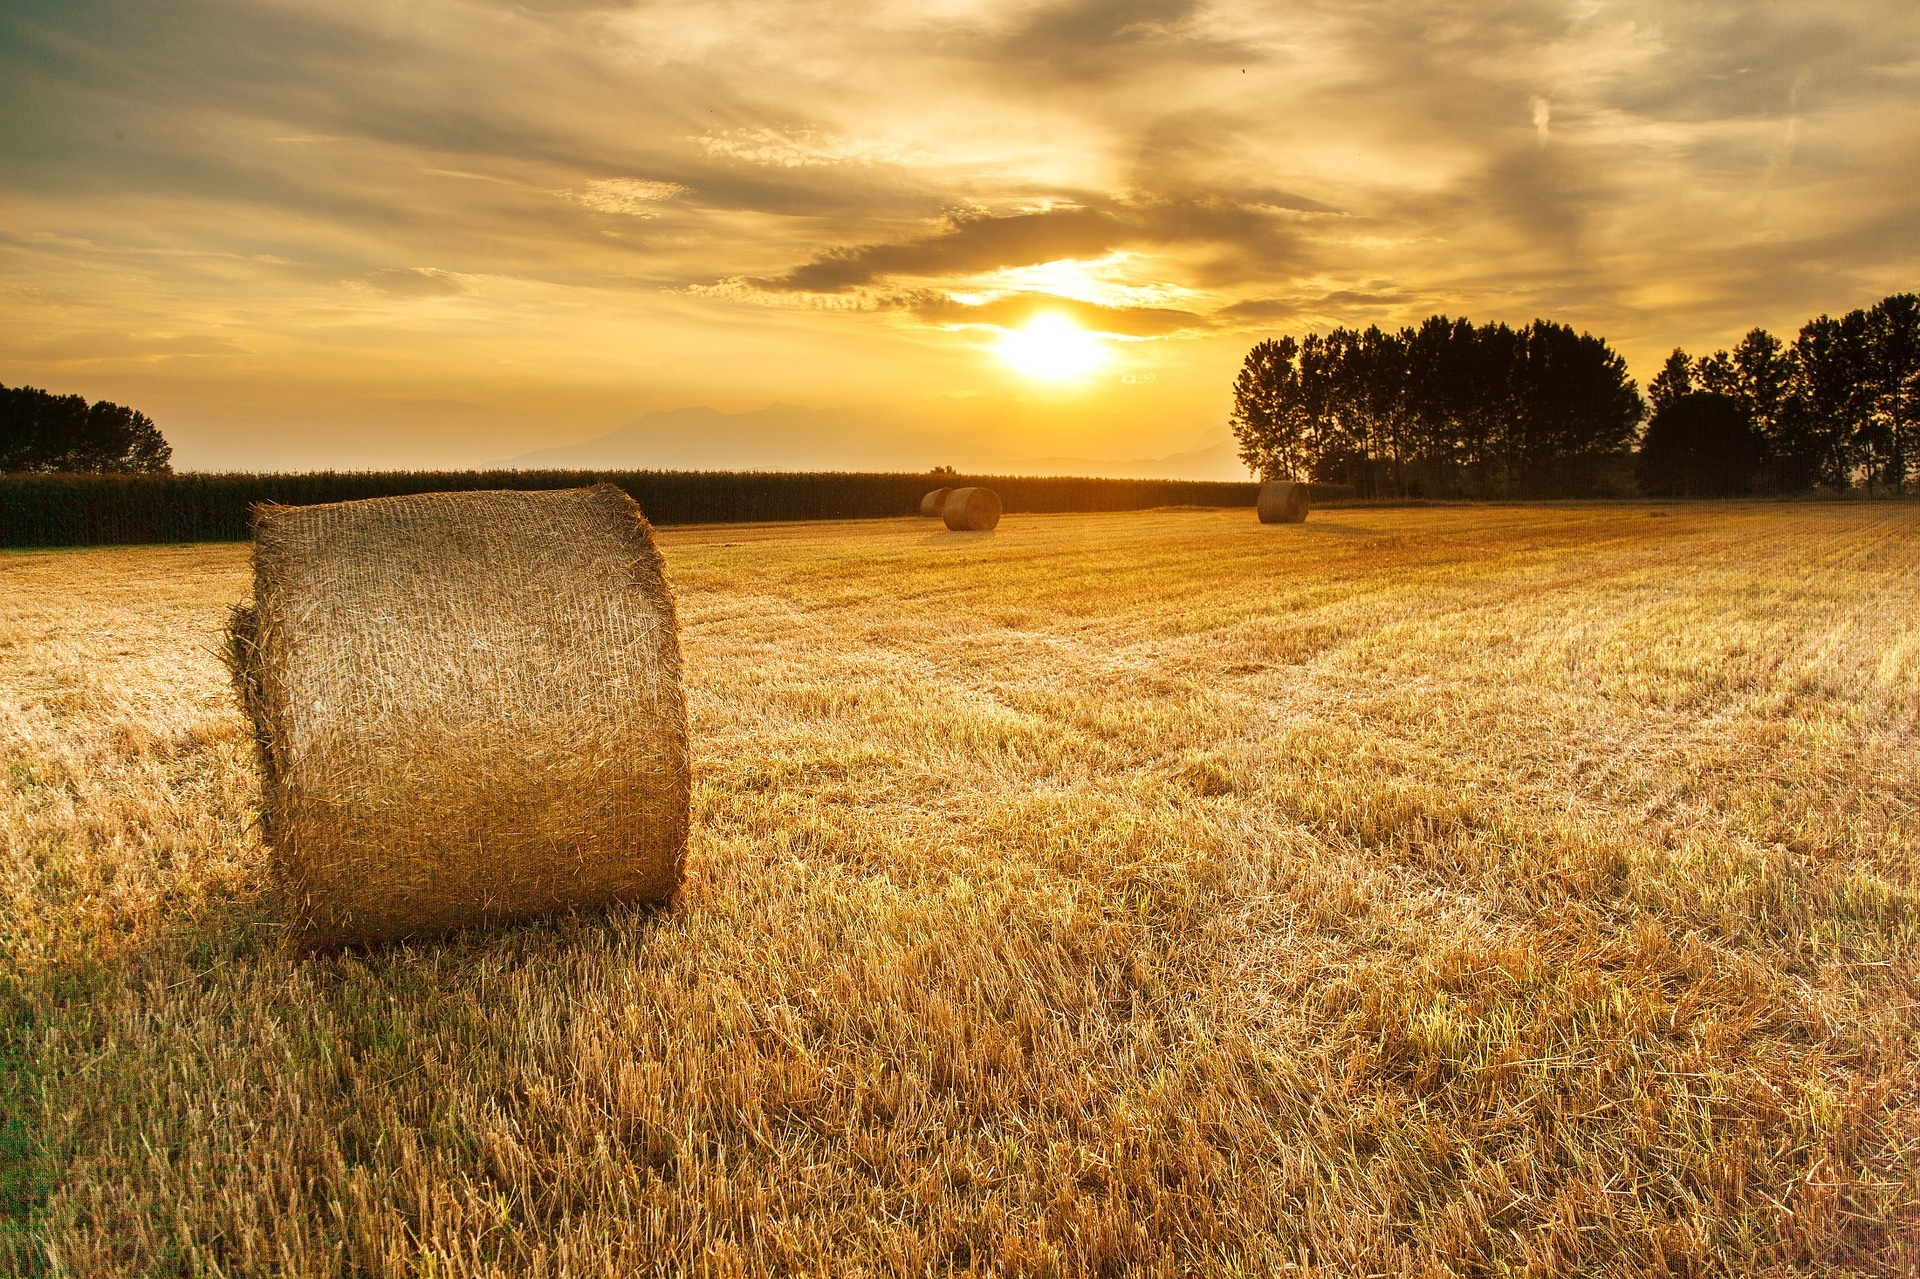 Hay field photo